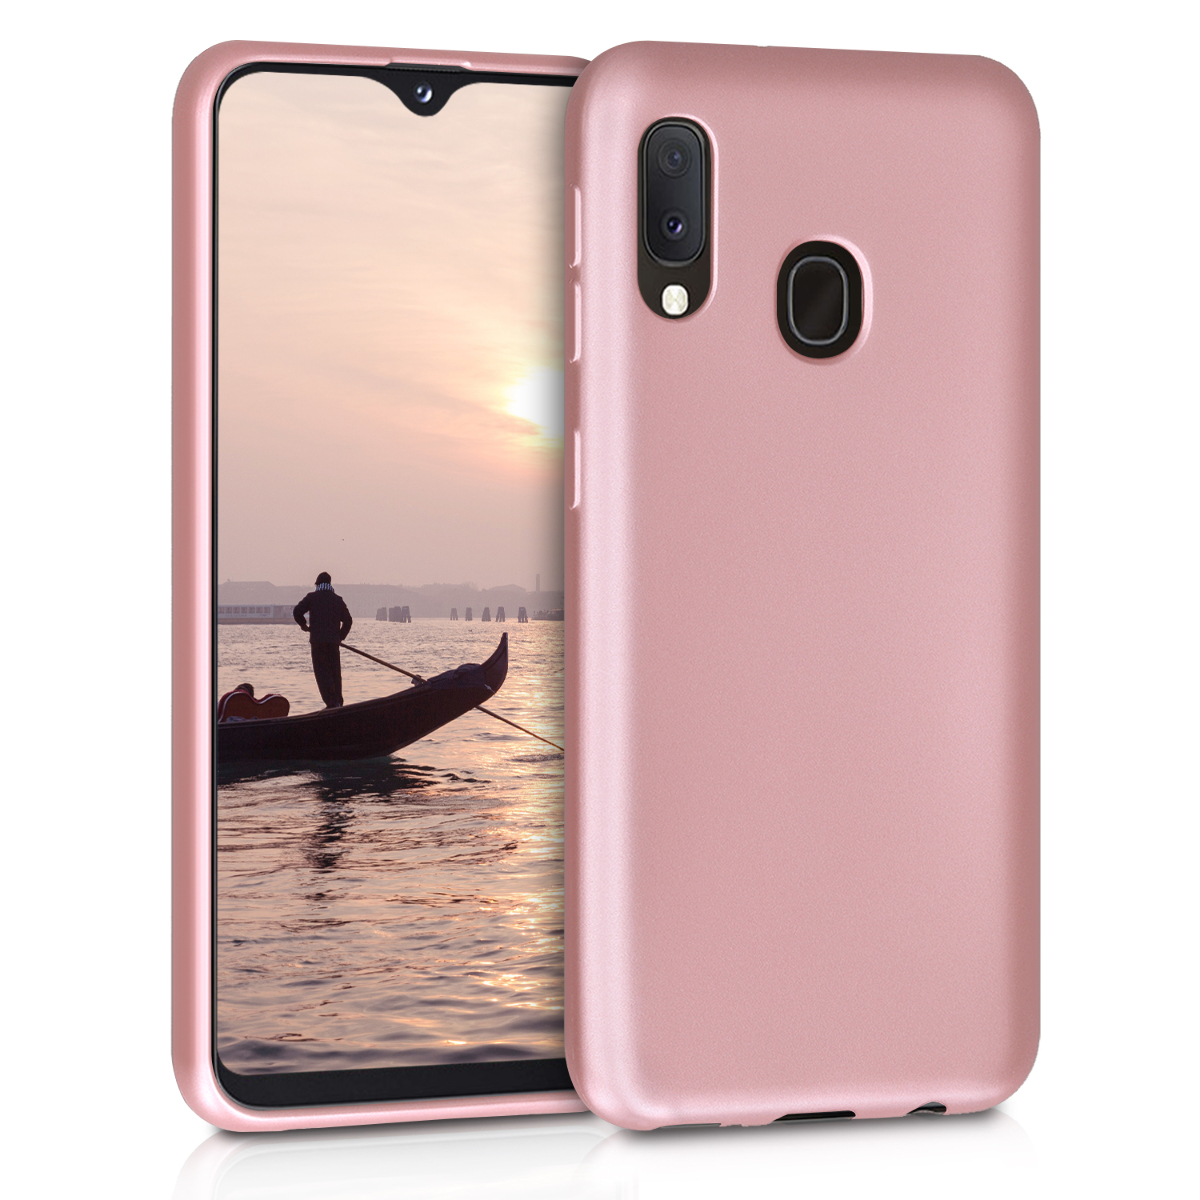 KW Θήκη Σιλικόνης Samsung Galaxy A20e  - Metallic Rose Gold (48739.31)